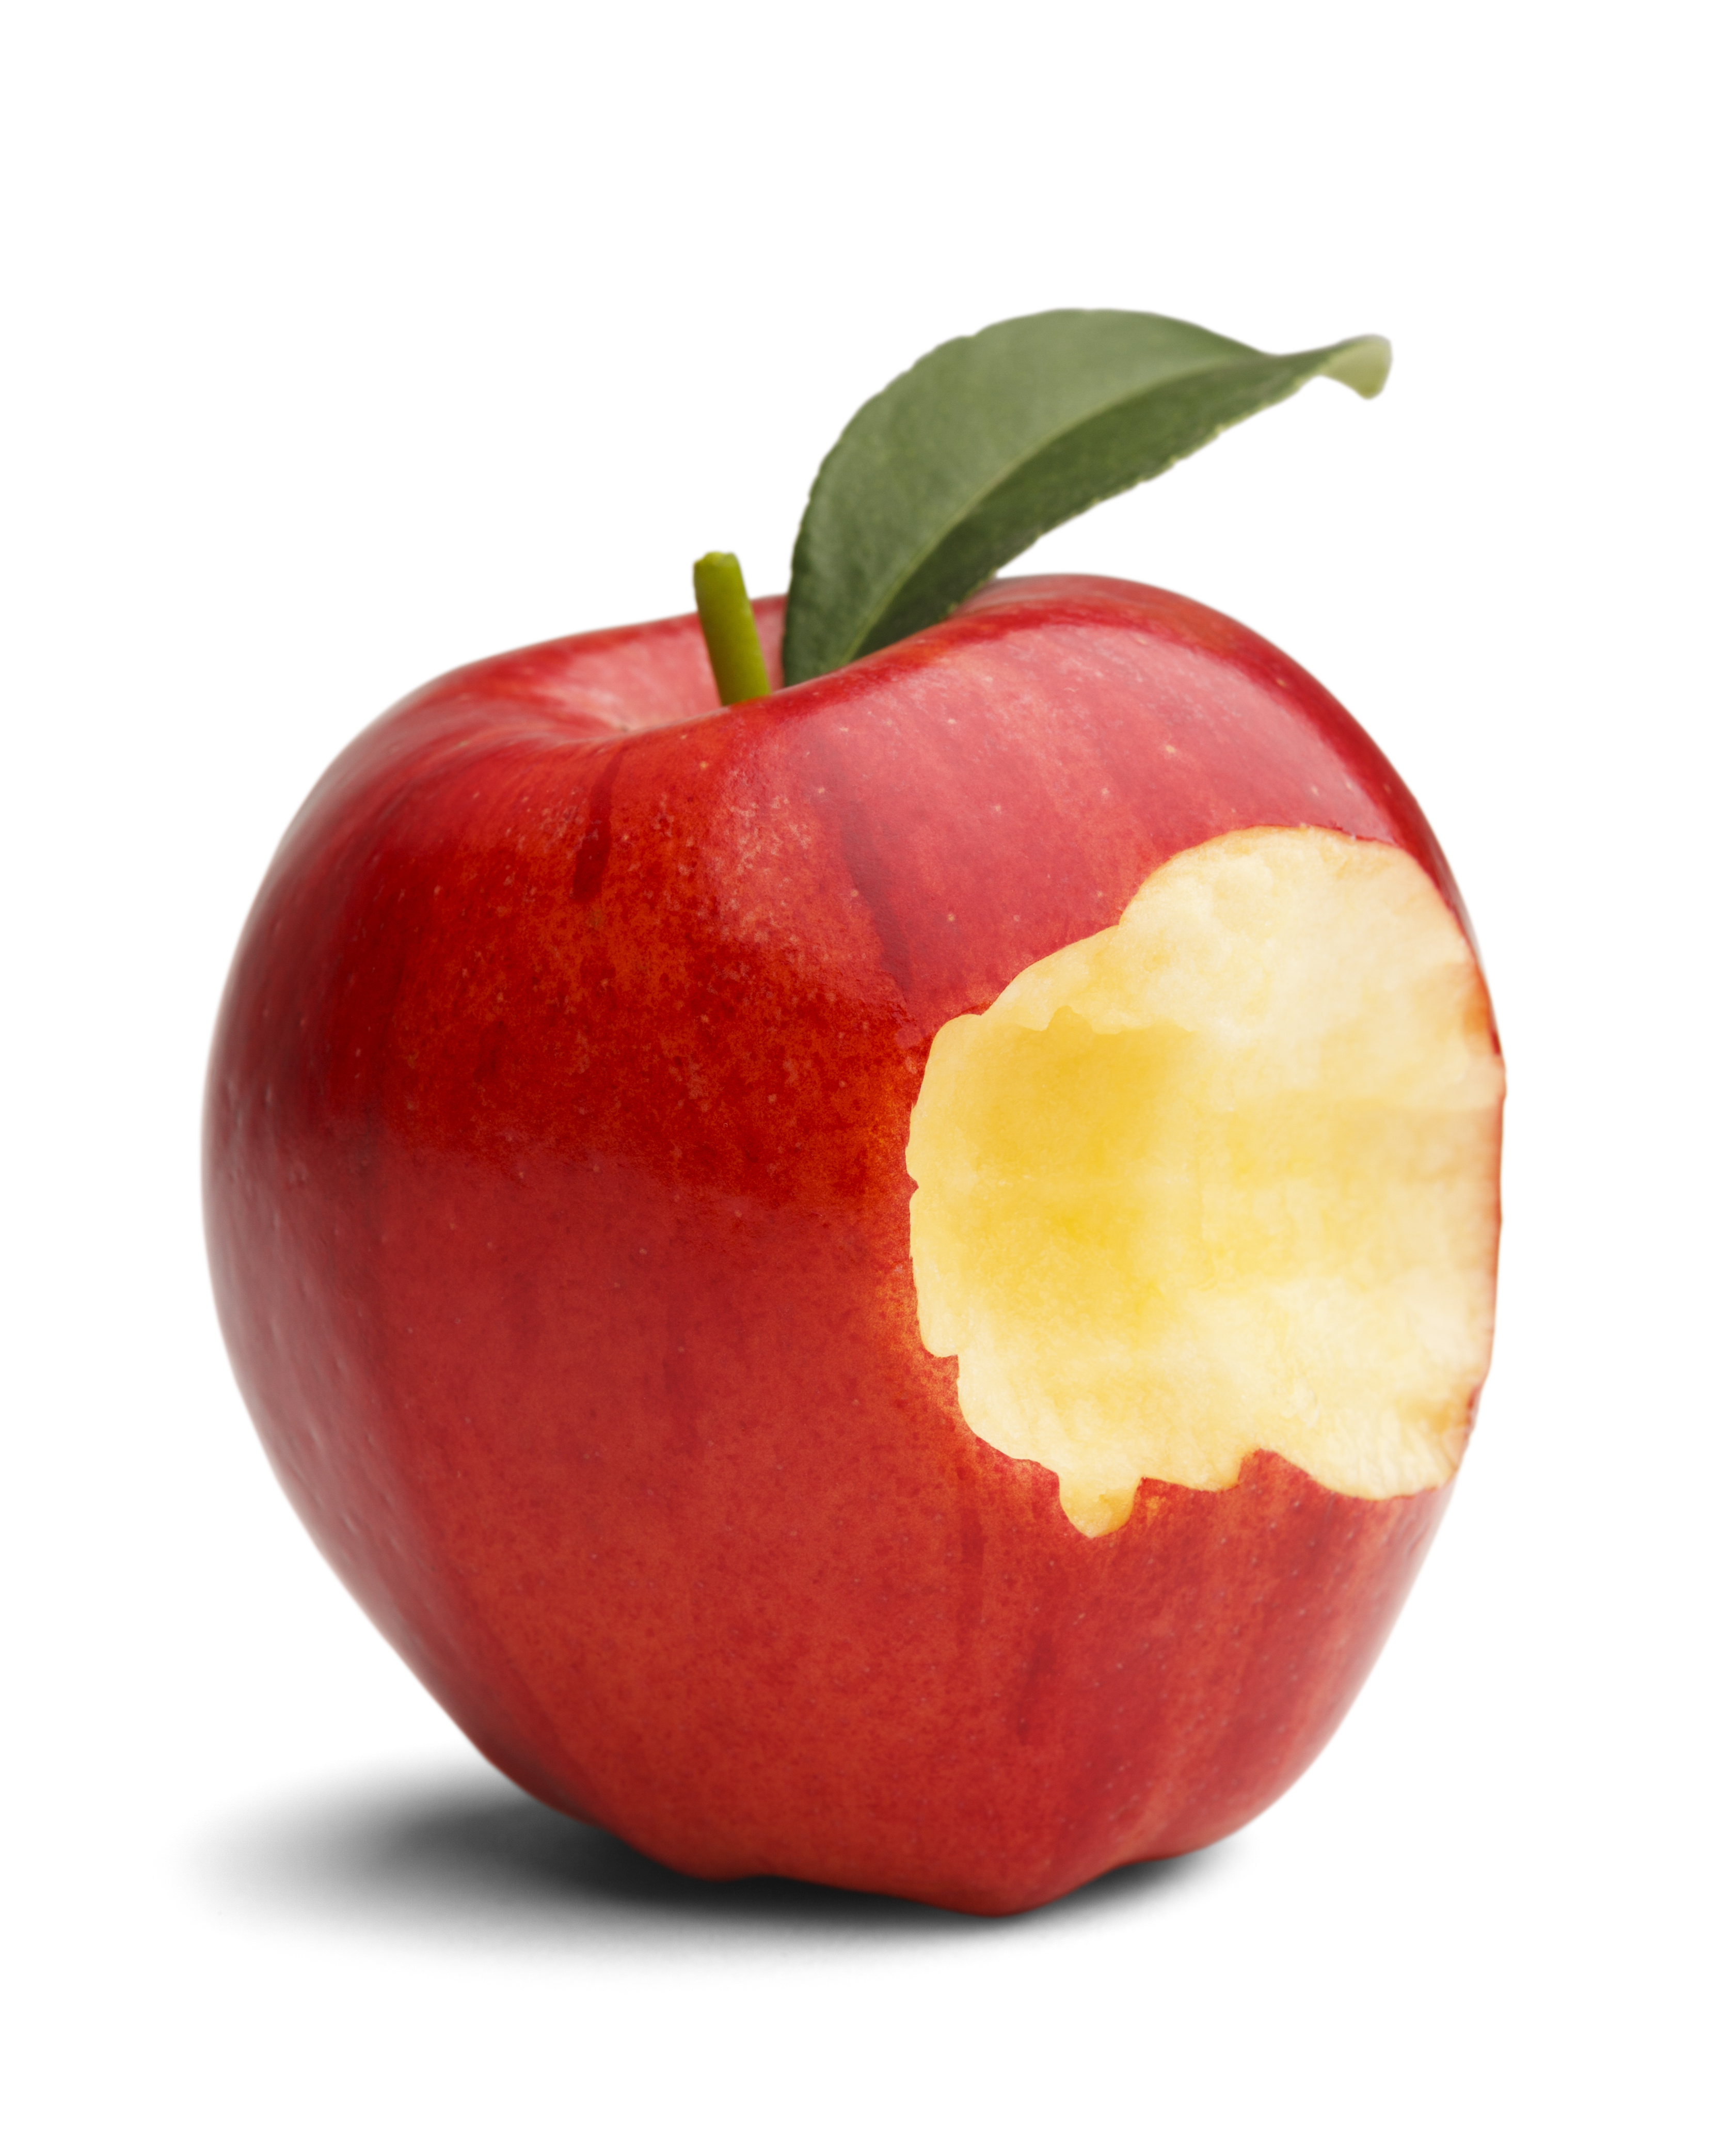 Bitten Red Apple 4245435 3363x4166 All For Desktop 3363x4166